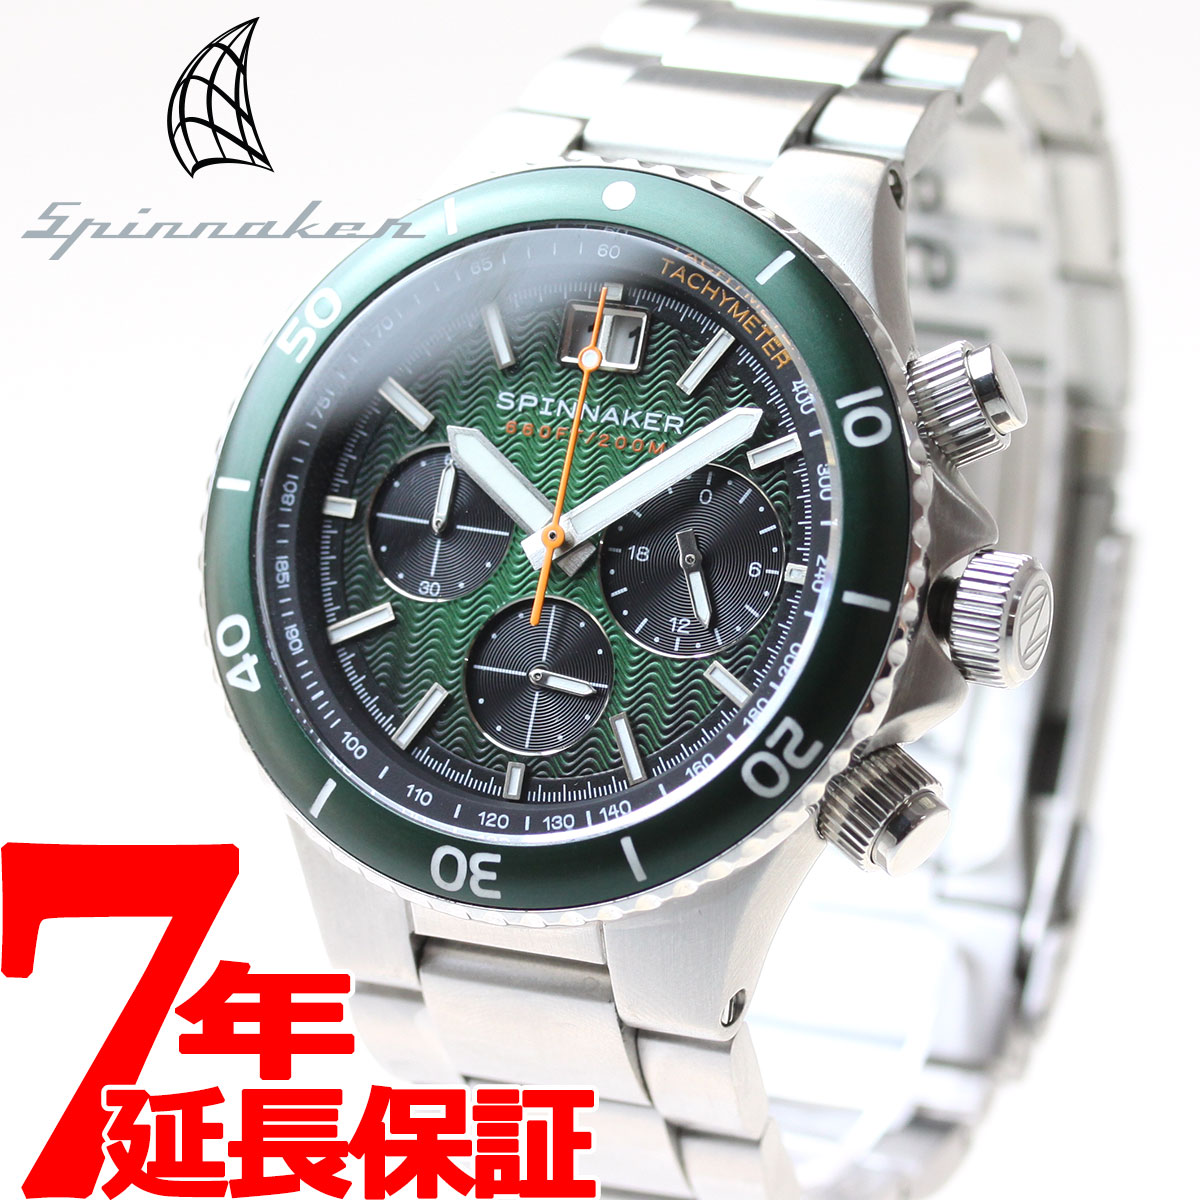 SP-5086-44